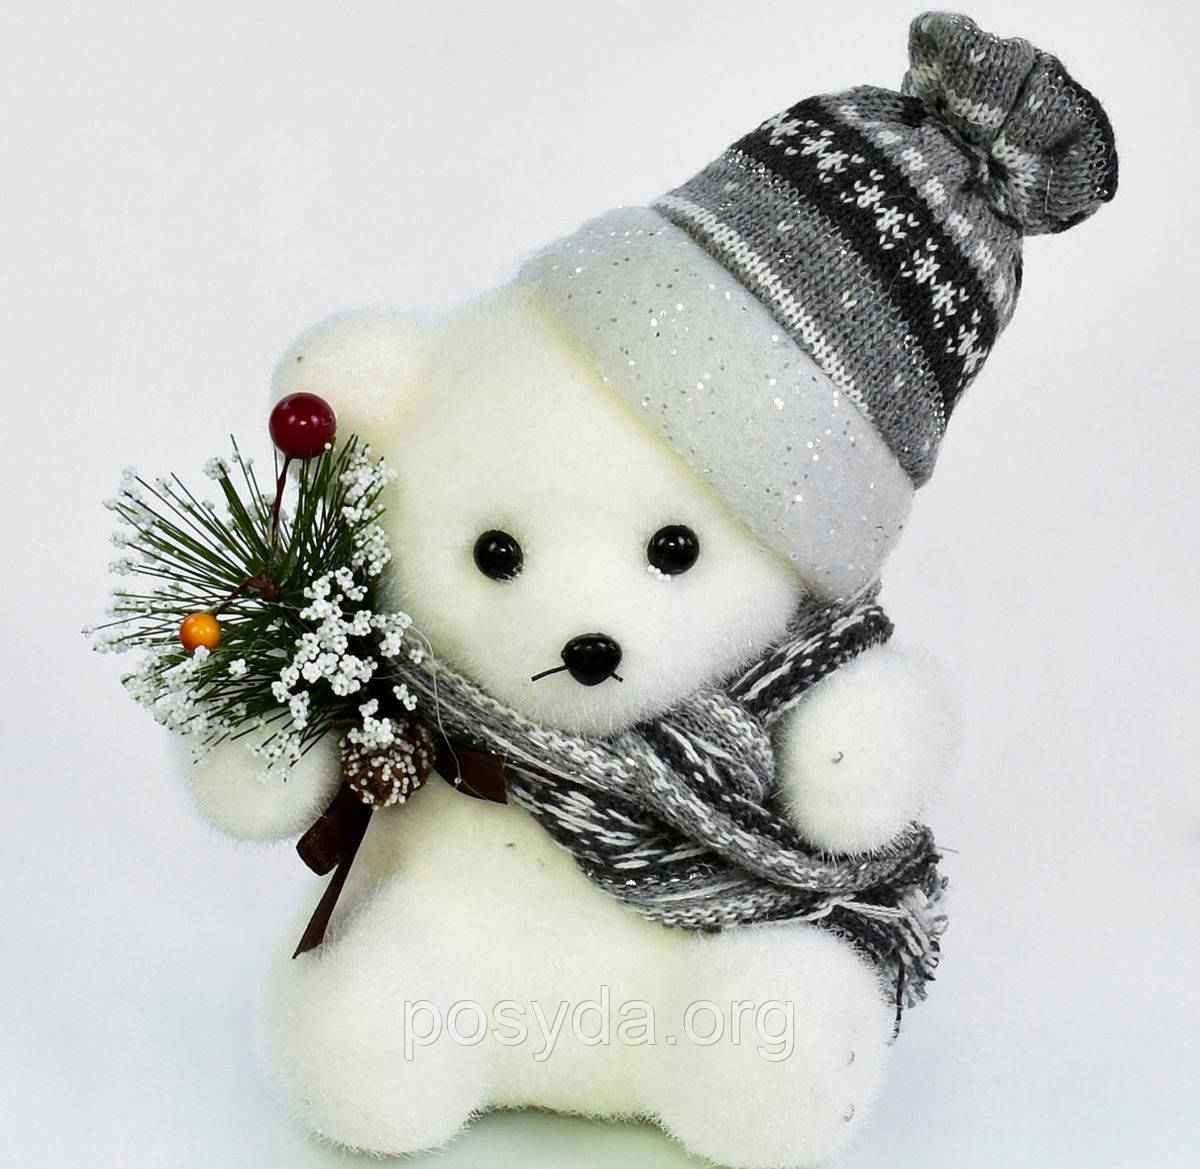 Декоративная фигурка Медвежонок C 30562  20 см